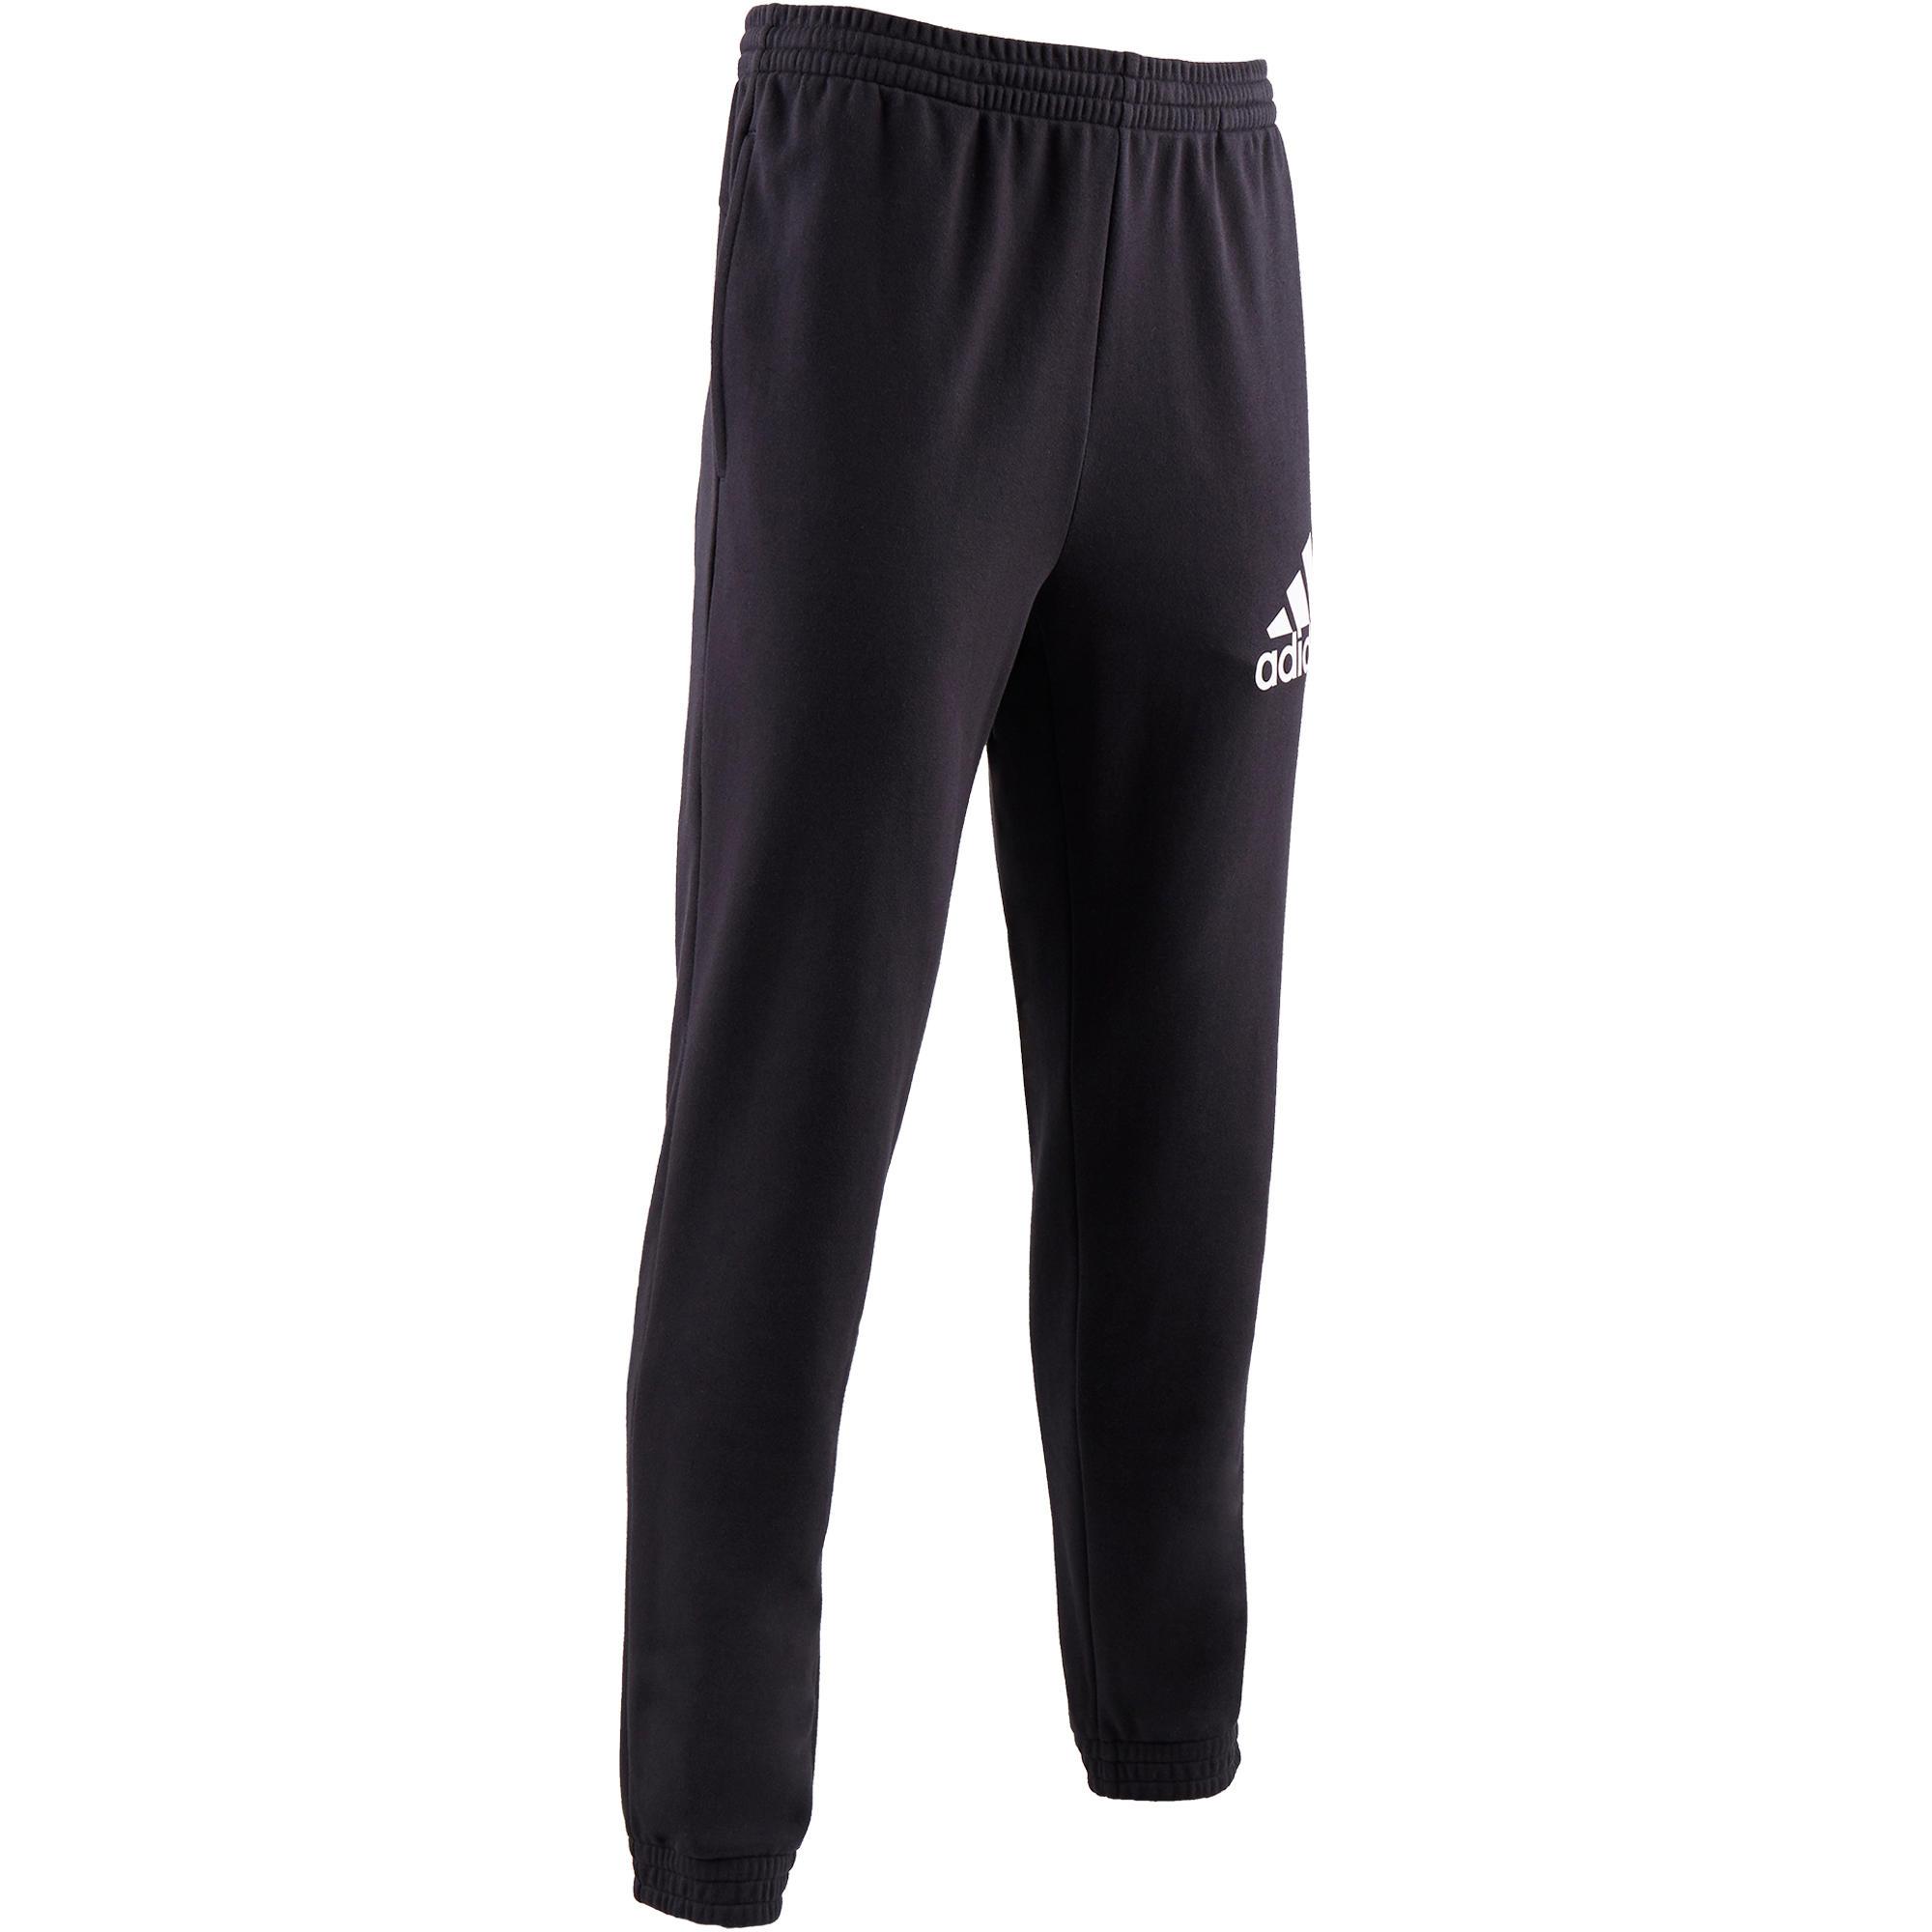 Pantalón adidas slim gimnasia stretching negro hombre jpg 250x250 Bombachos  pantalones adidas 1b3c274e380fd